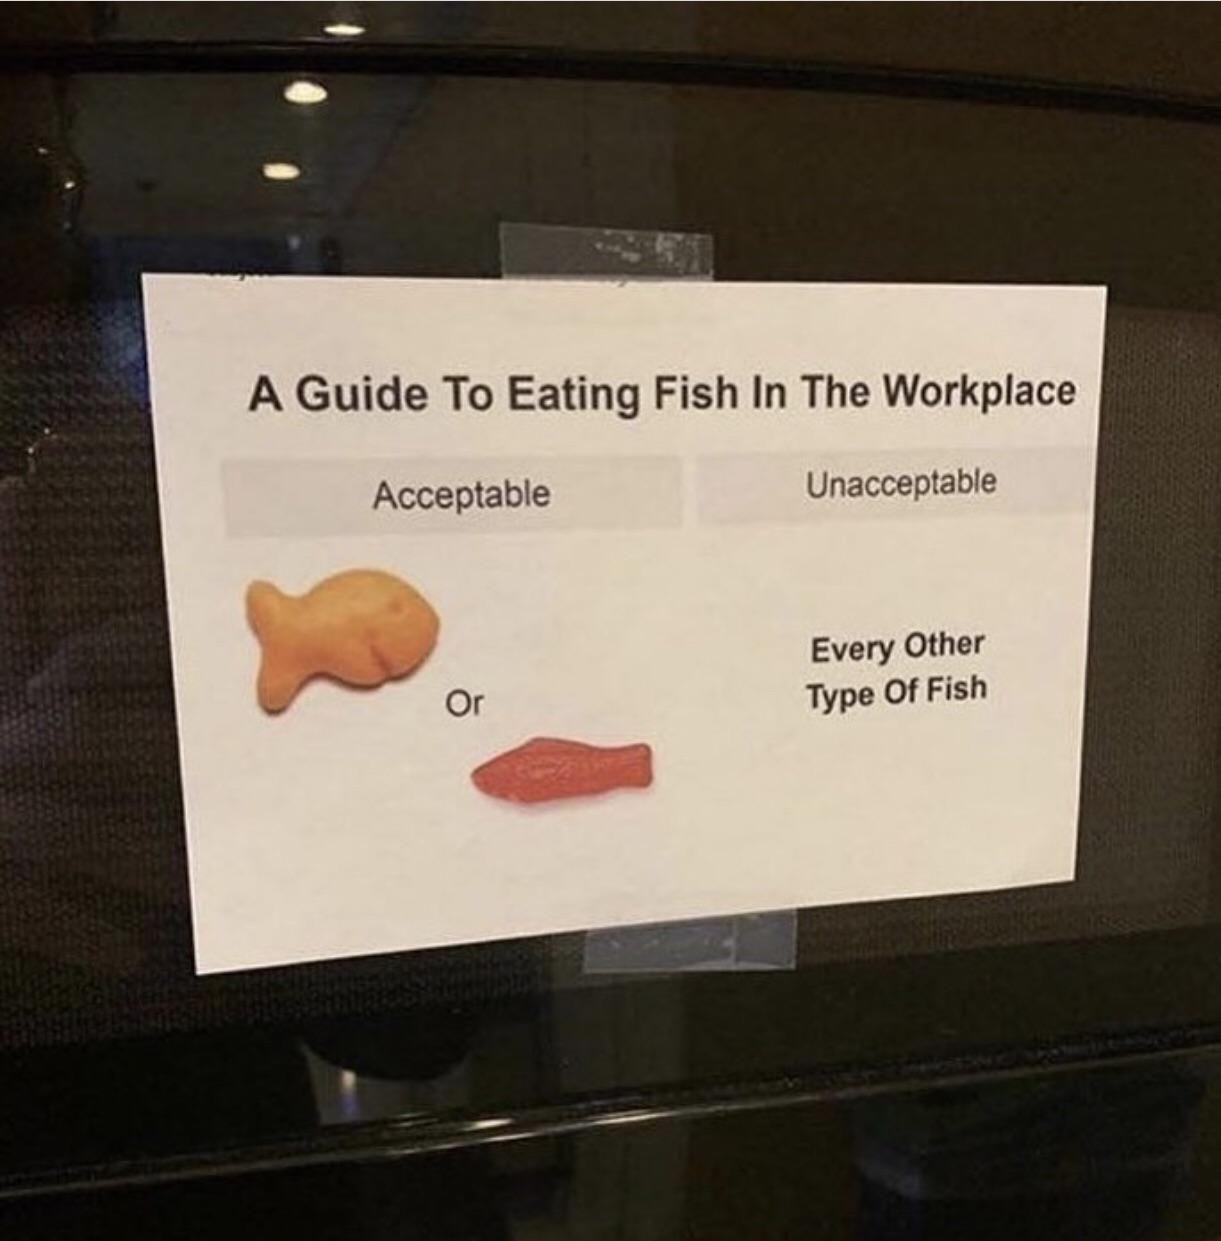 Seems fishy